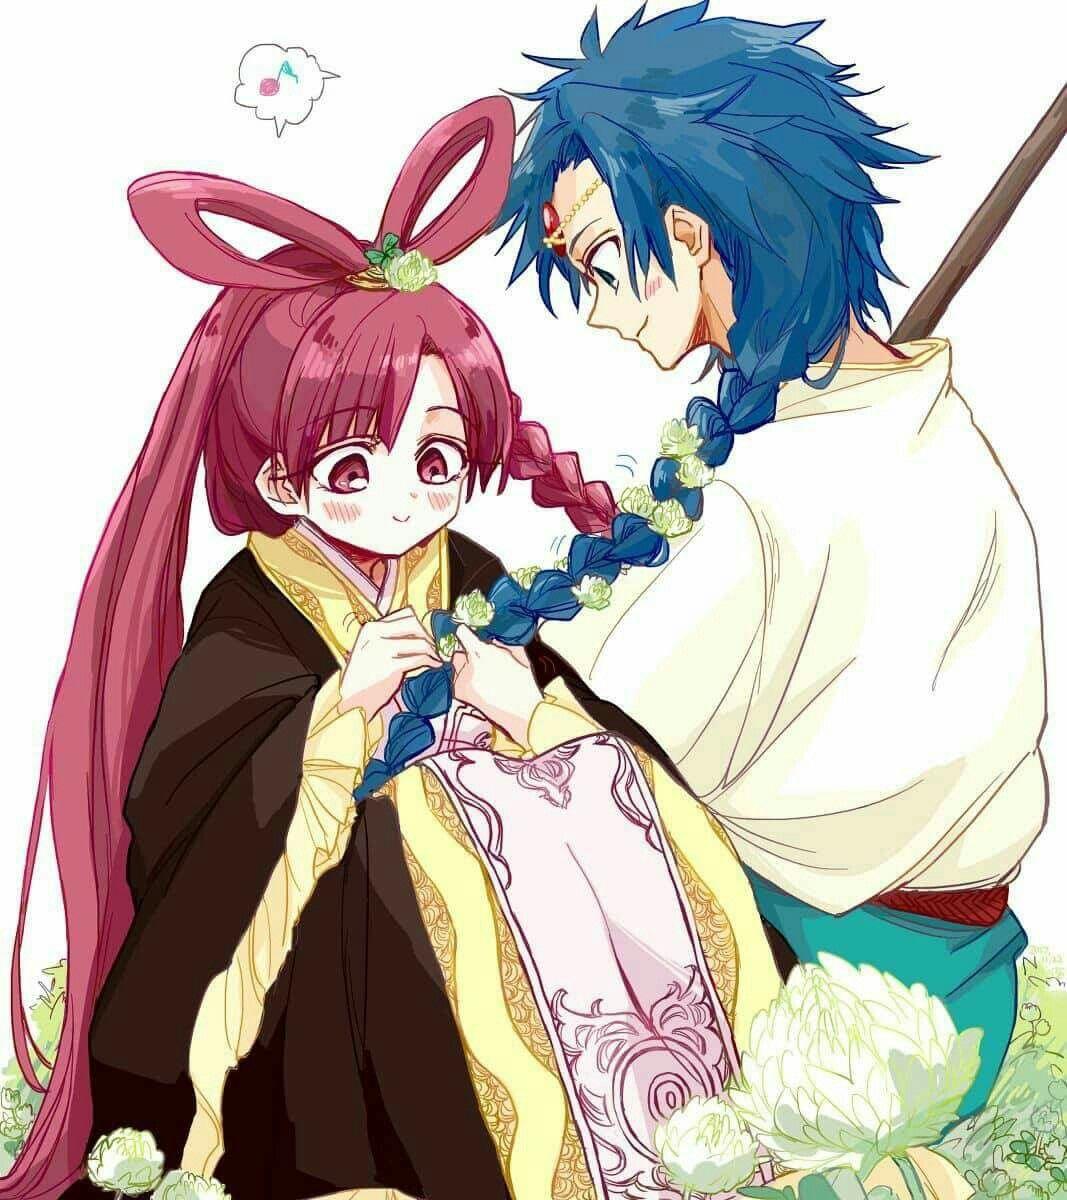 I ship it Anime magi, Aladdin magi, Sinbad magi